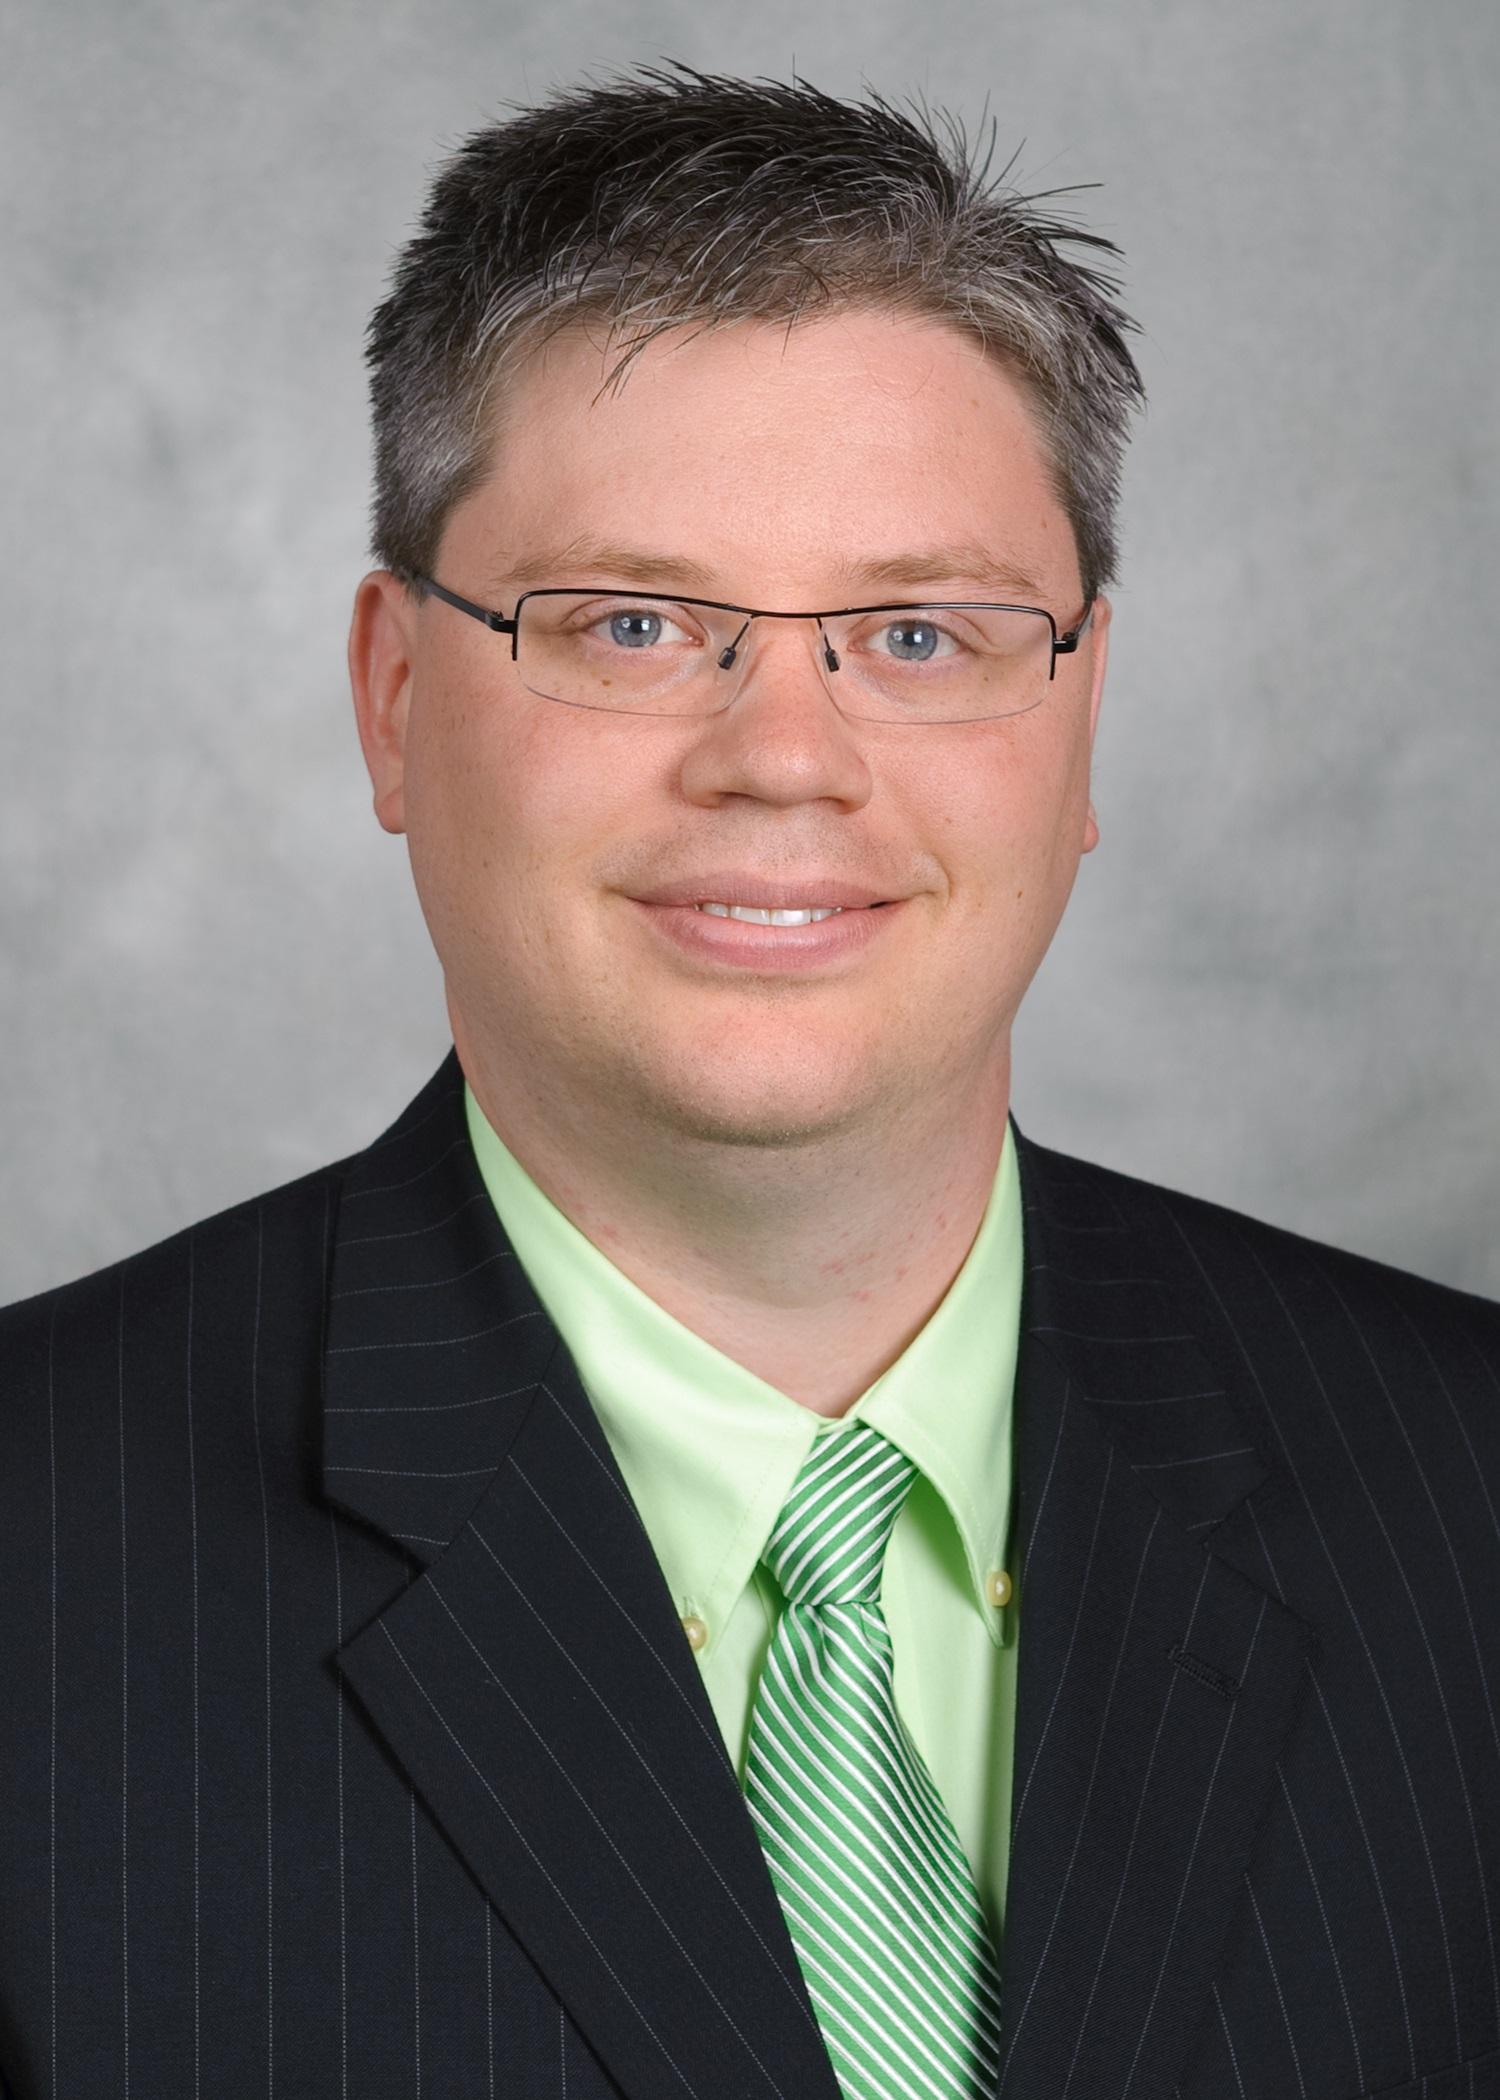 Brandon Wynn, DO